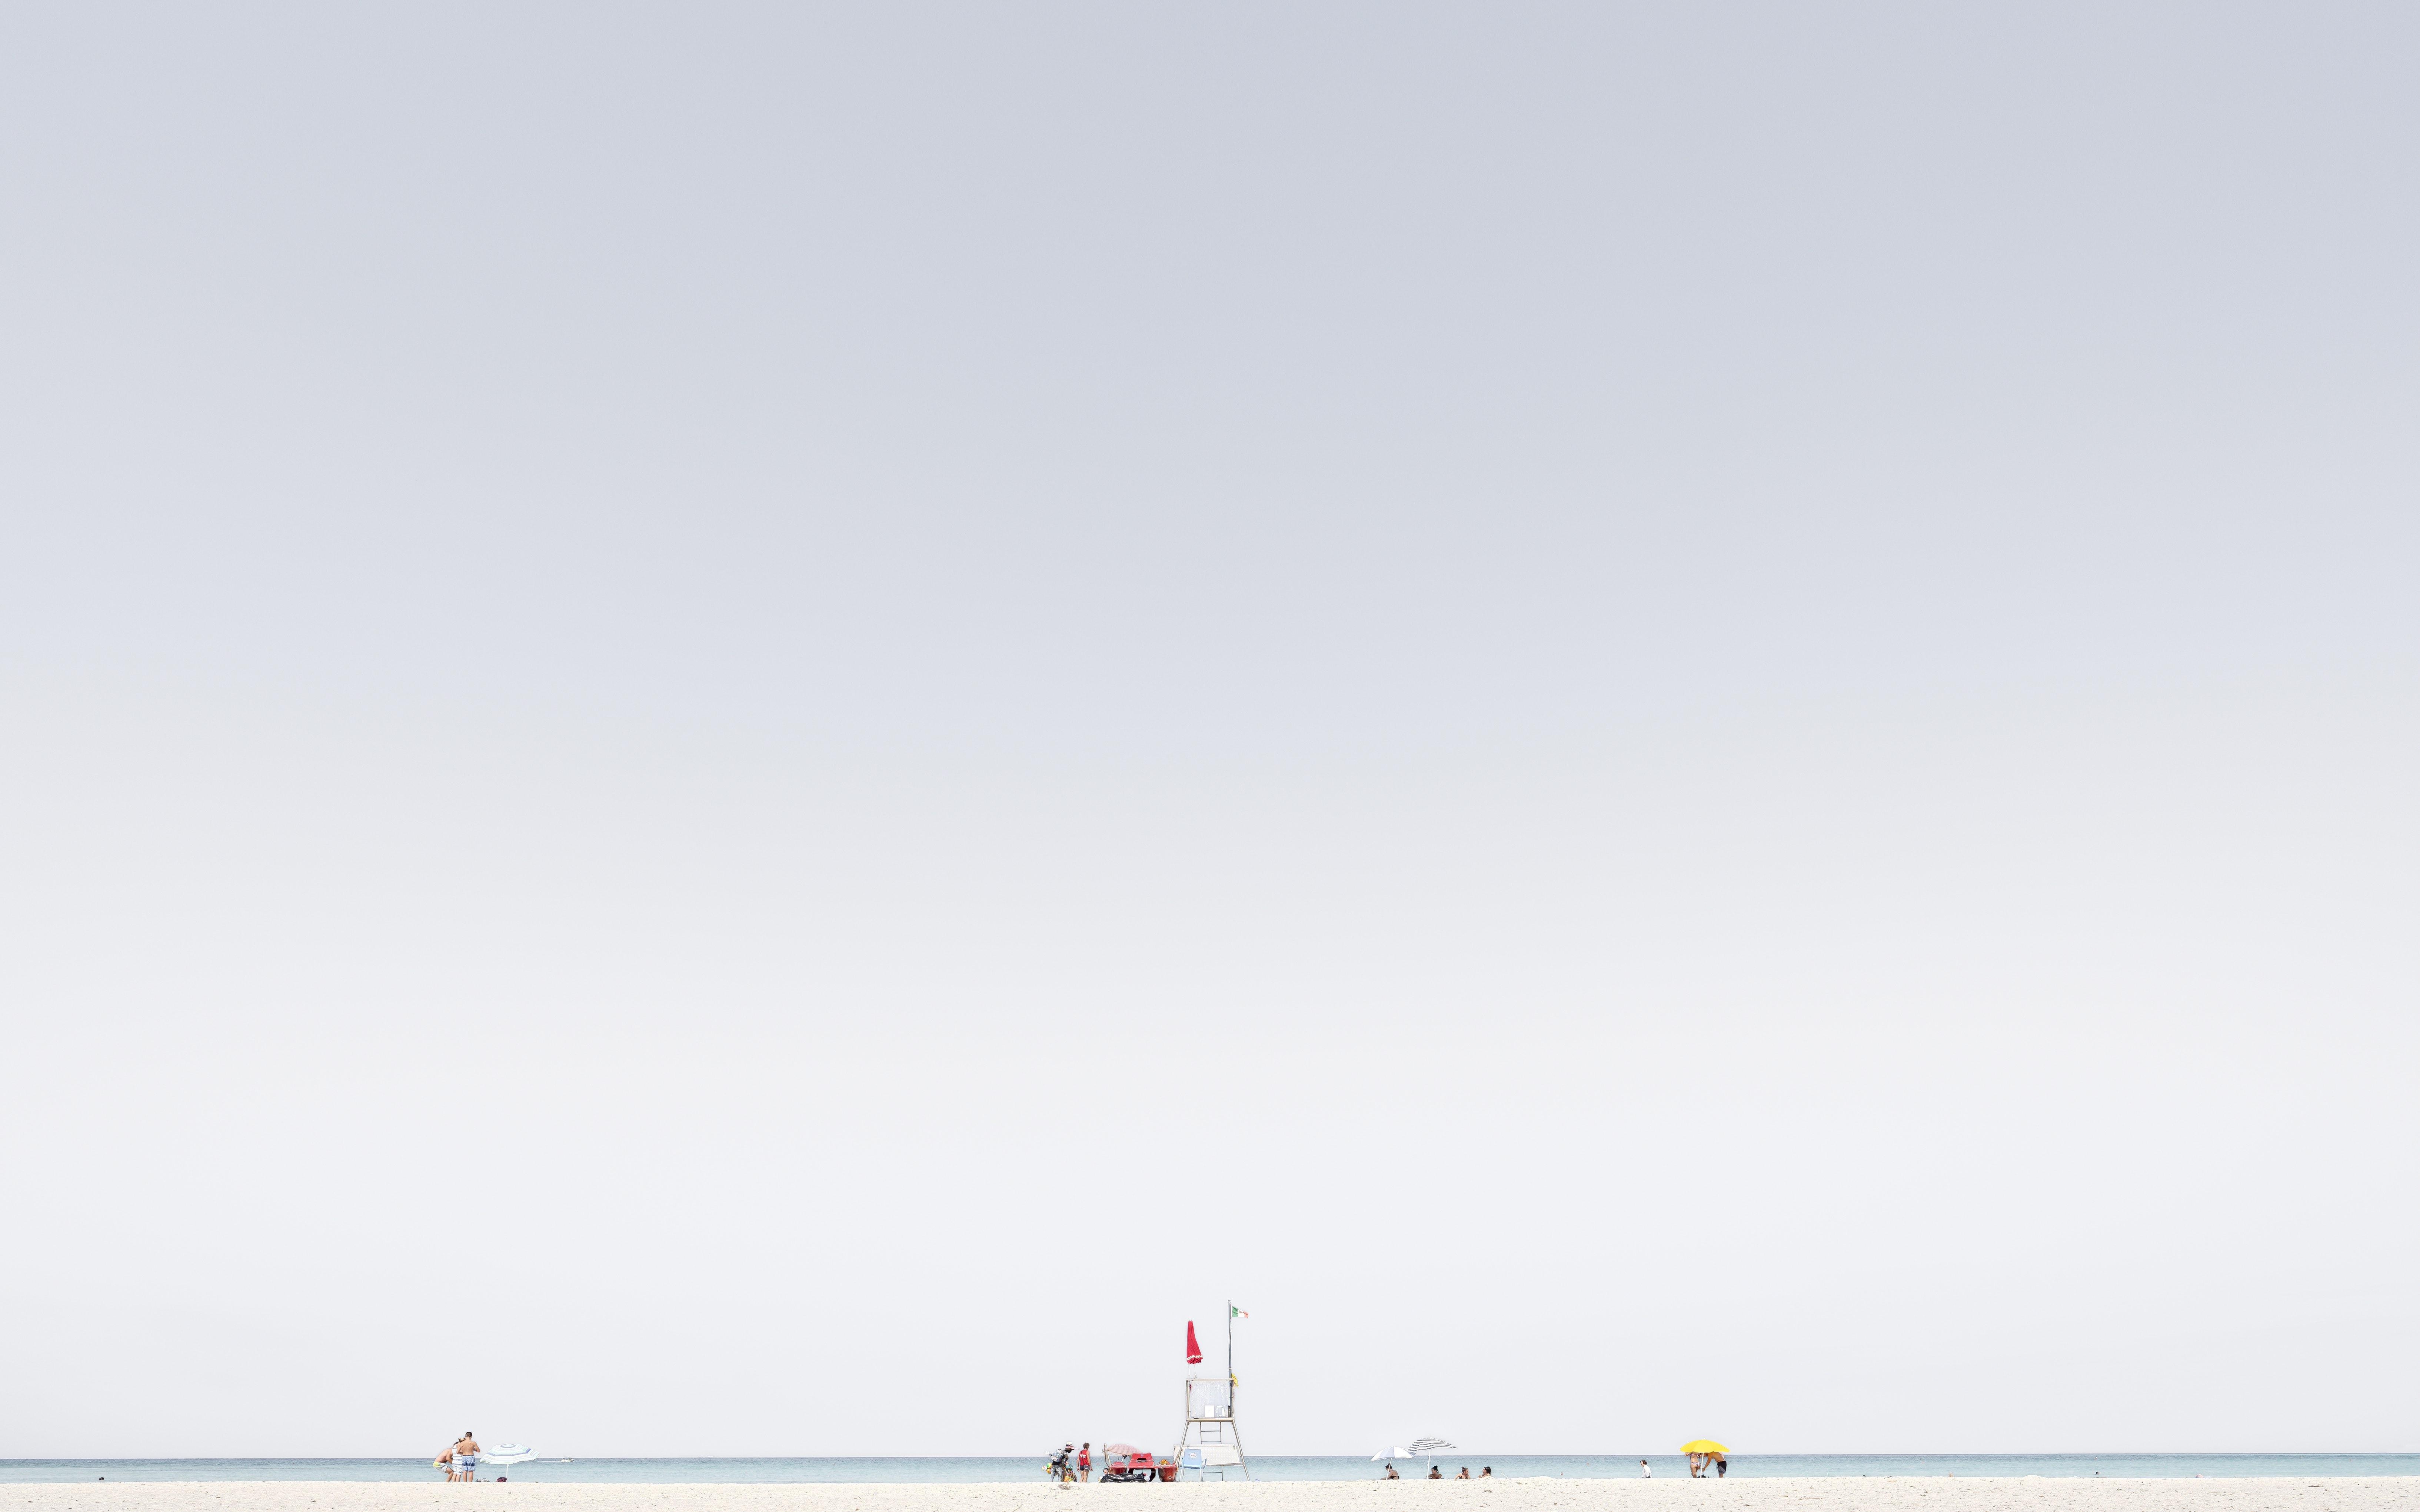 Luca Lupi, Finis sterrae, Spiaggie Bianche, Livorno, 2017, archival pigment print, 50x80 cm